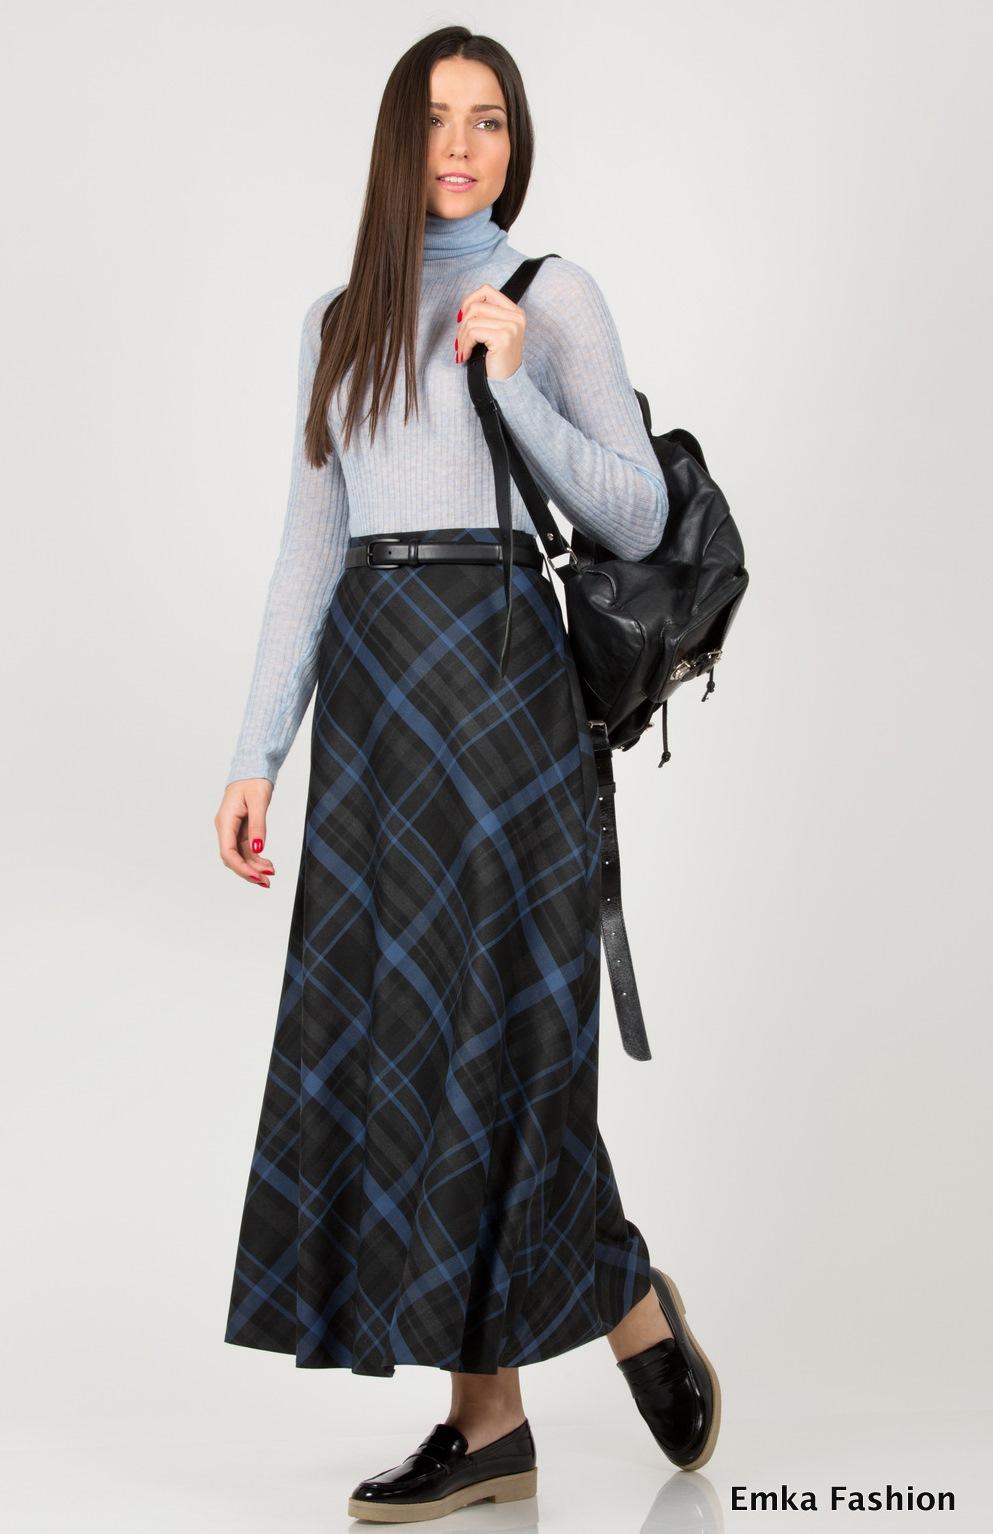 4b33c8508 Макси-юбка в клетку Emka Fashion 314-sogdiana - Malinka-fashion.ru